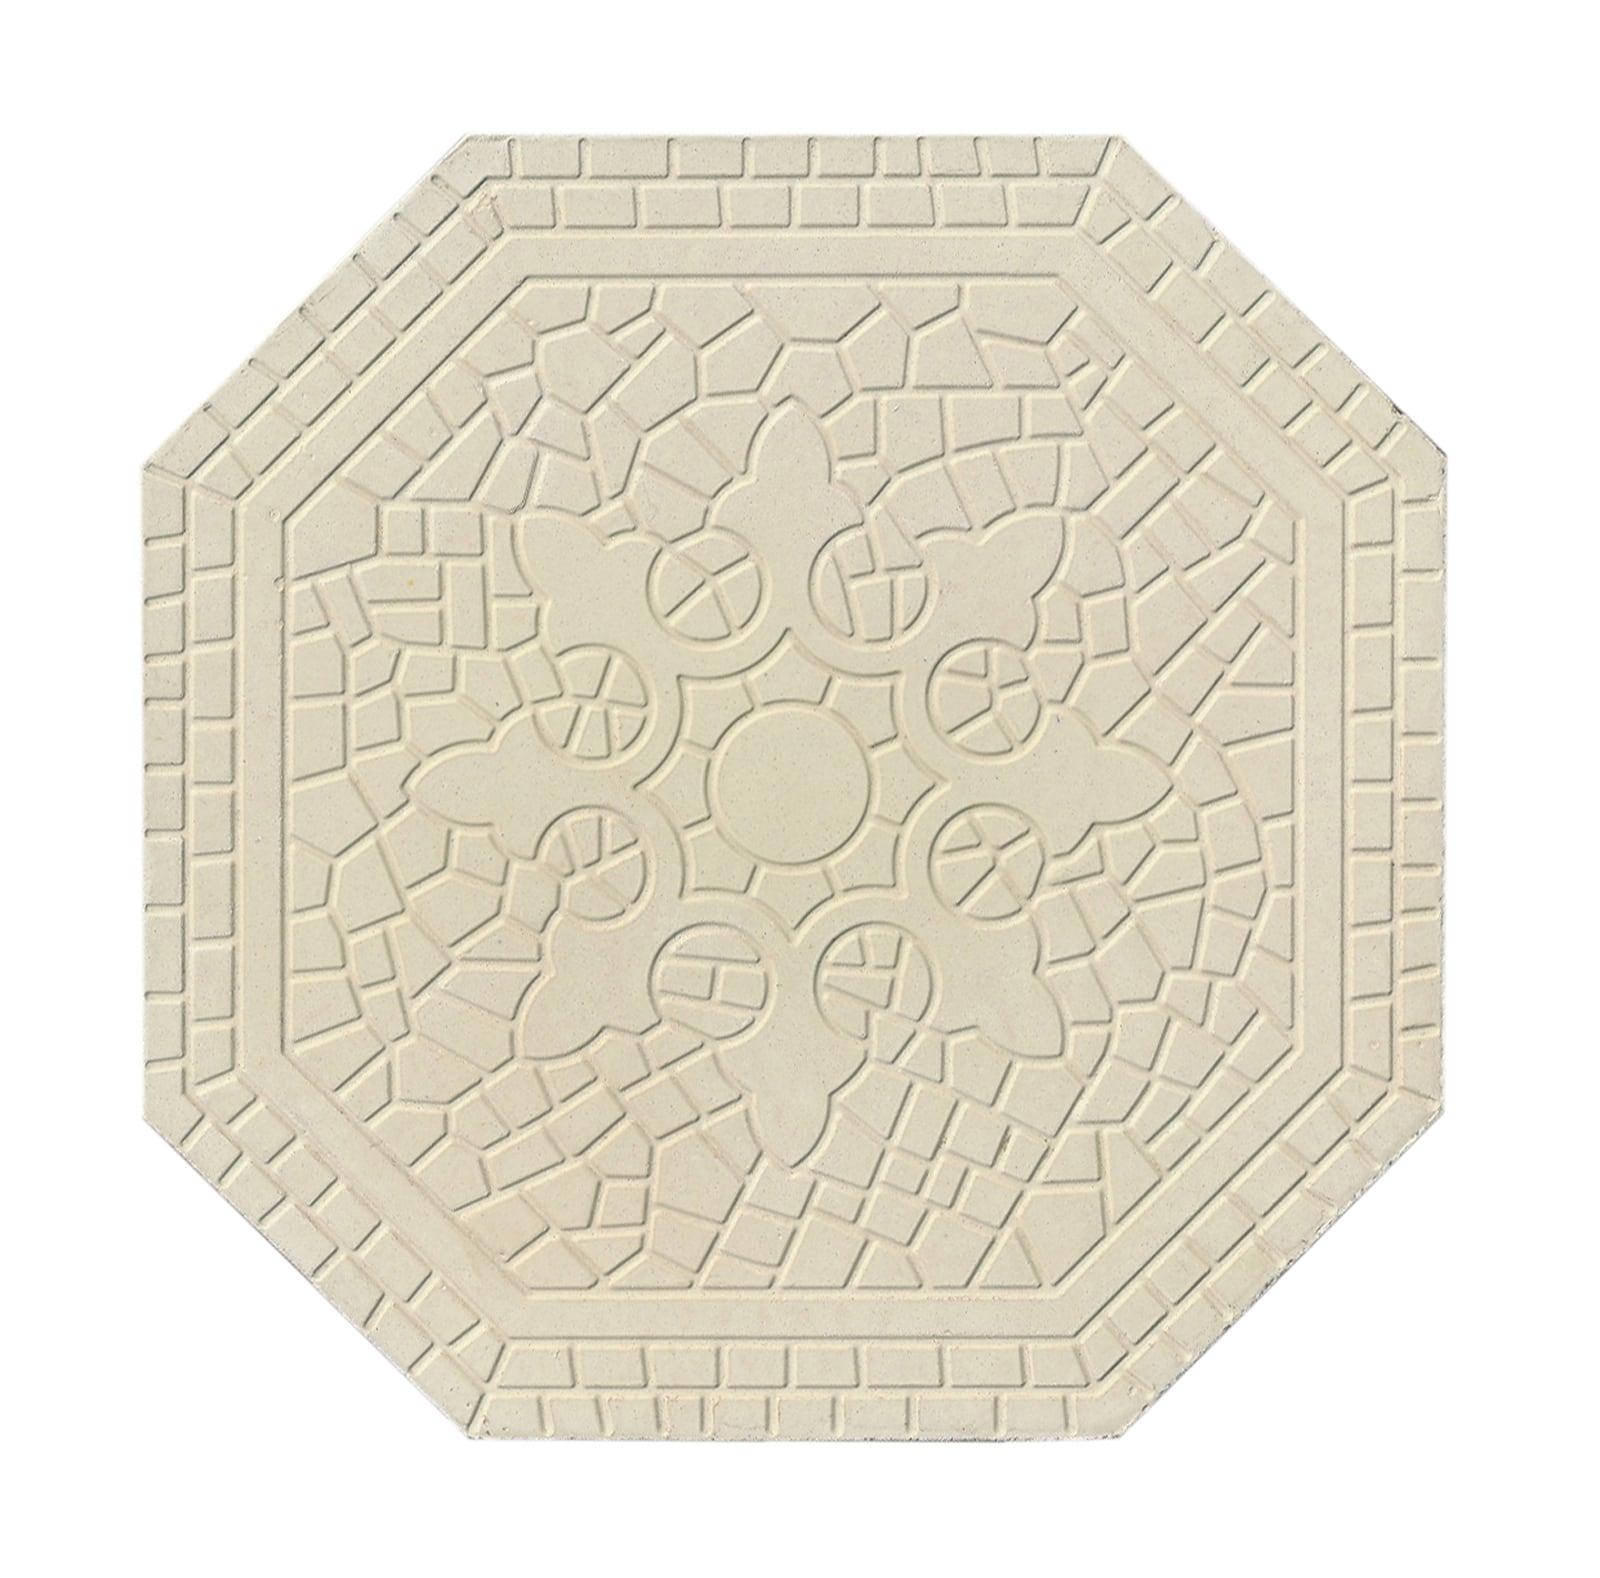 VIA-Zementmosaikplatten-nummer-51041-VIA-GmbH | 51041/170